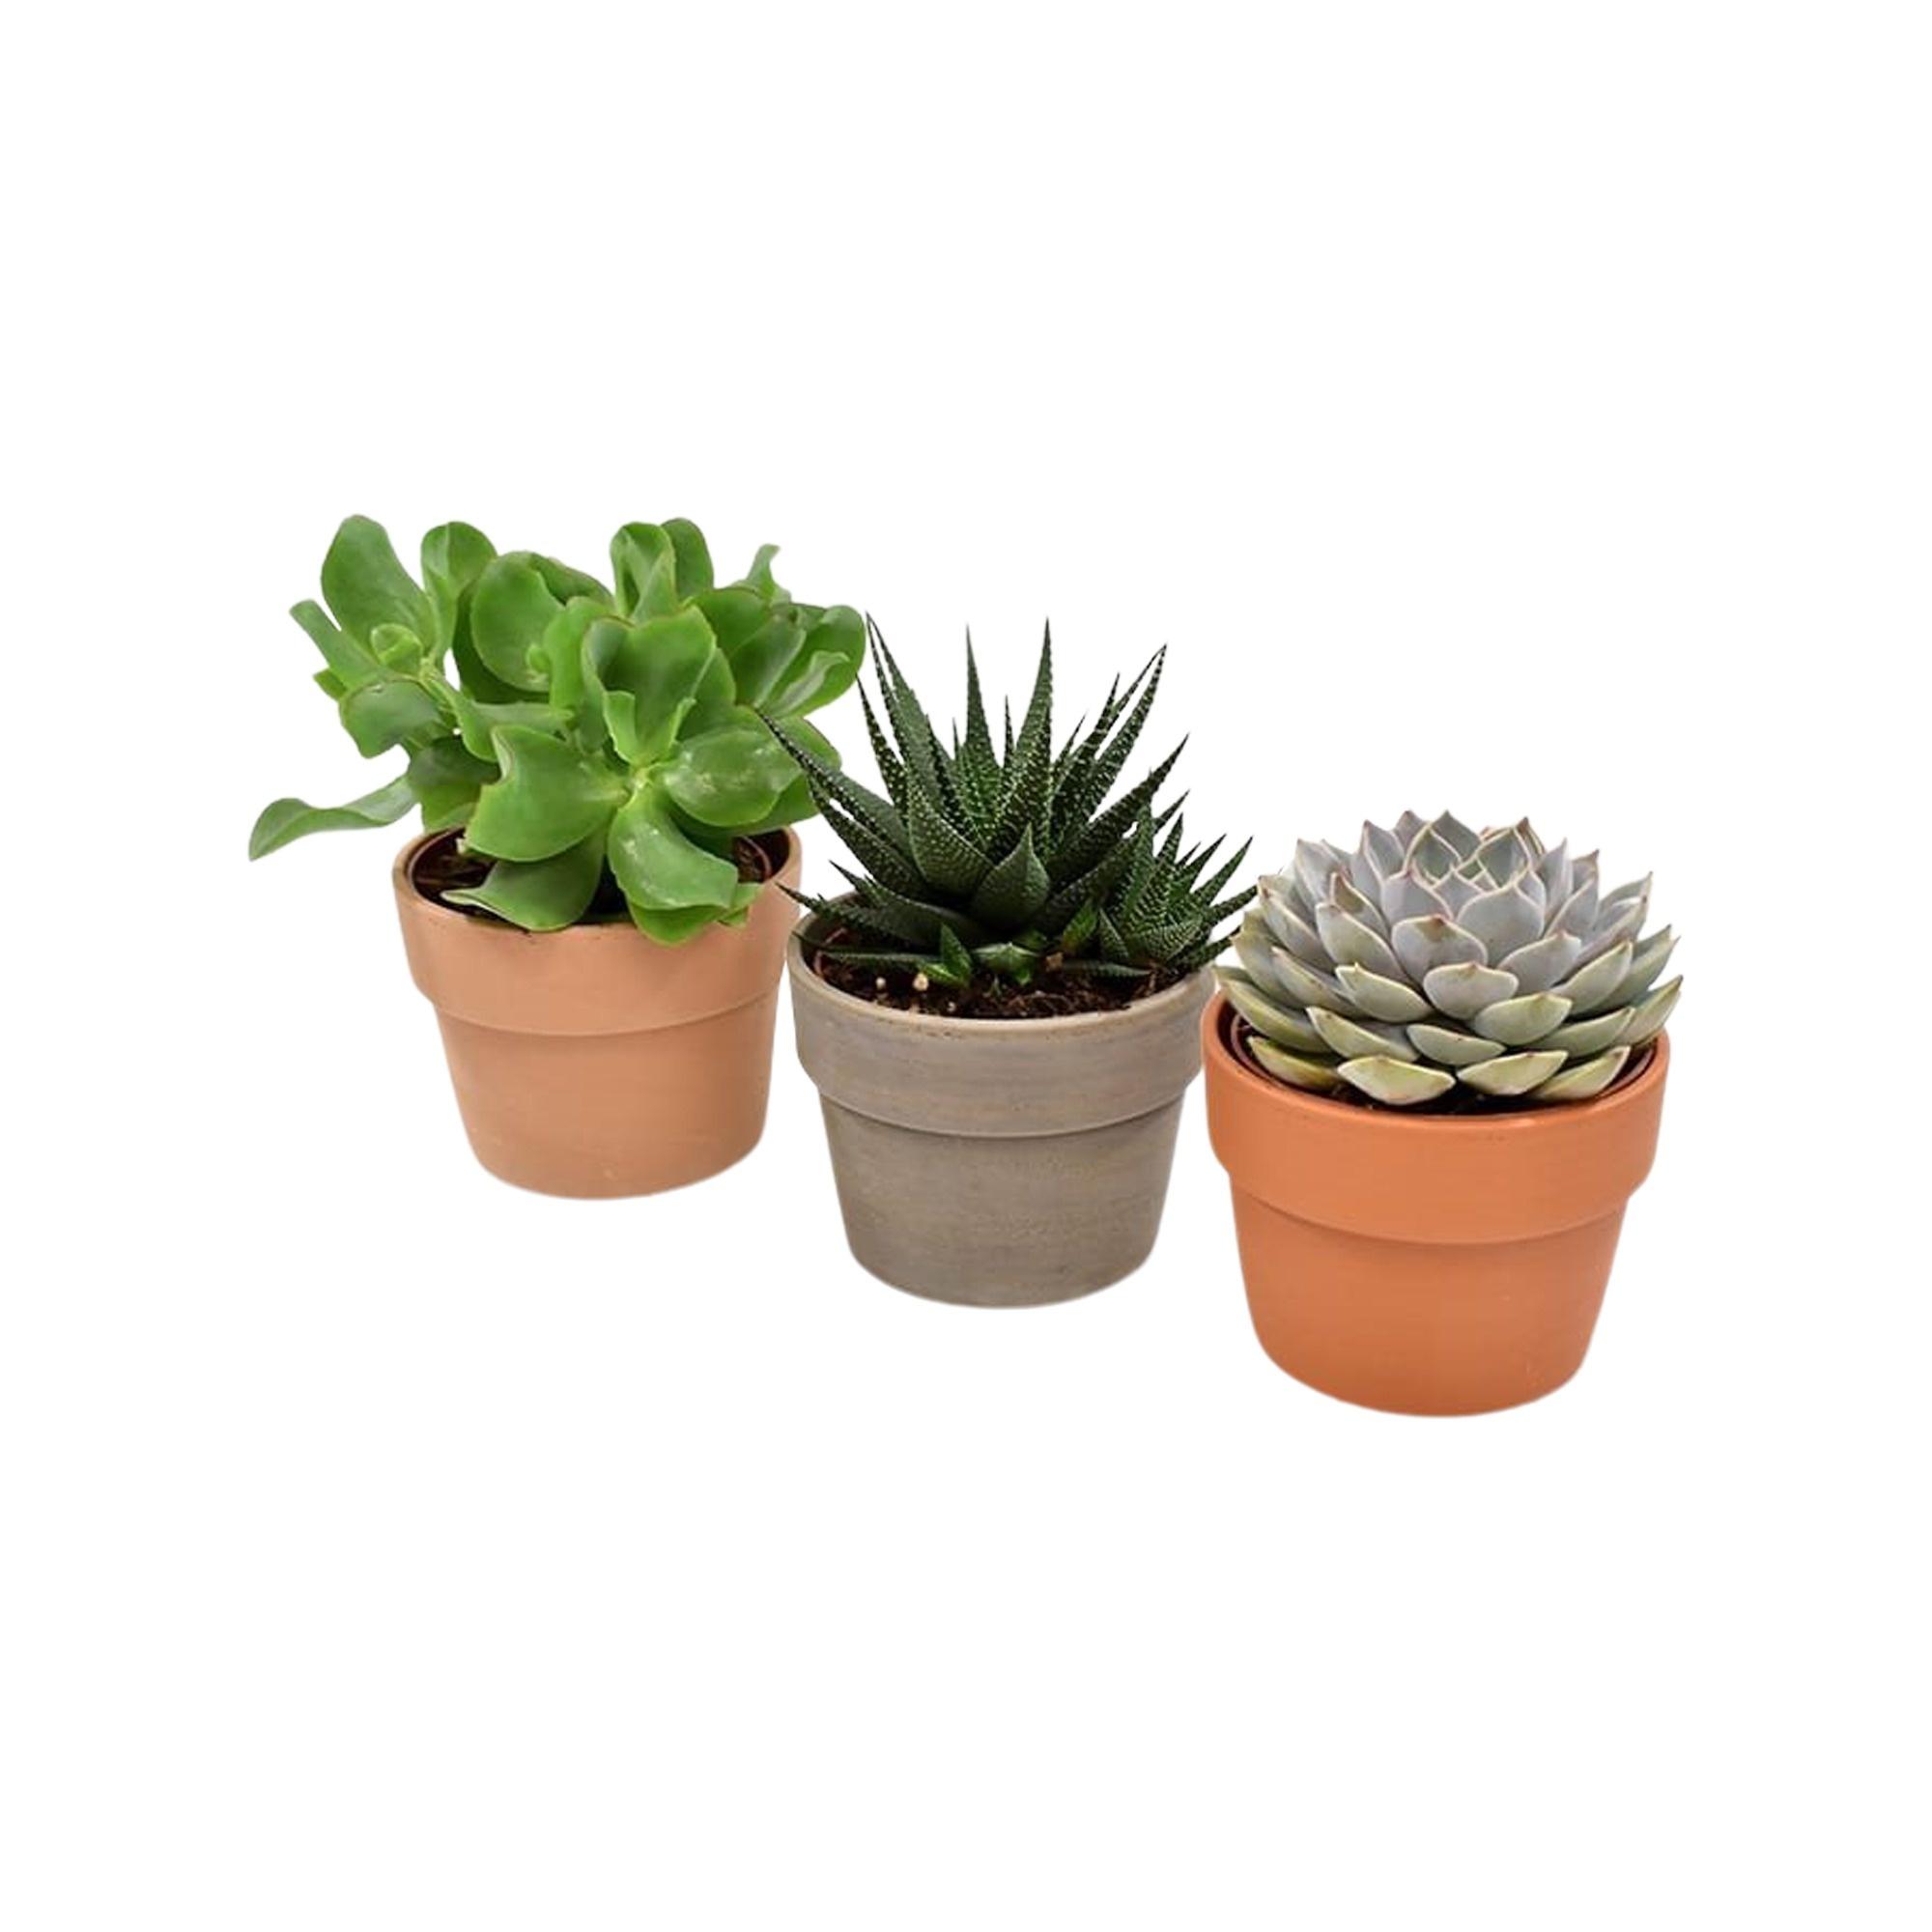 Trio vetplanten in terracotta keramiek (AS 258 - 10,5x16 cm)